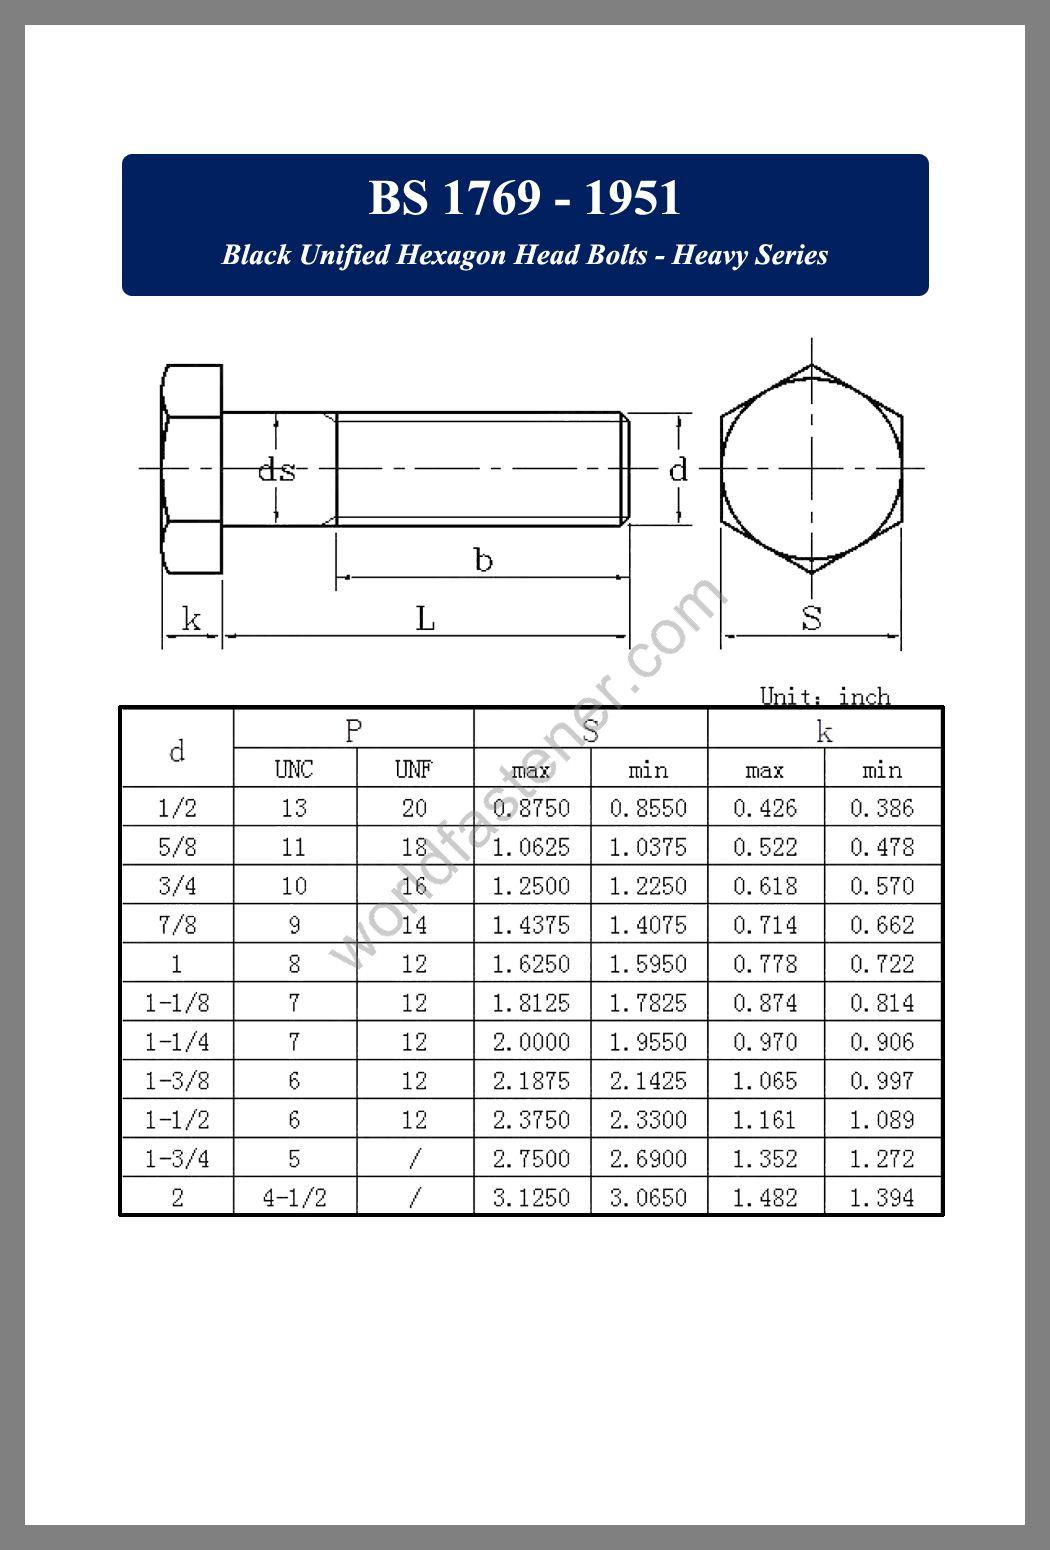 BS 1769, BS 1769 Black Unified Hexagon Head Bolts - Heavy Series, fastener, screw, bolt